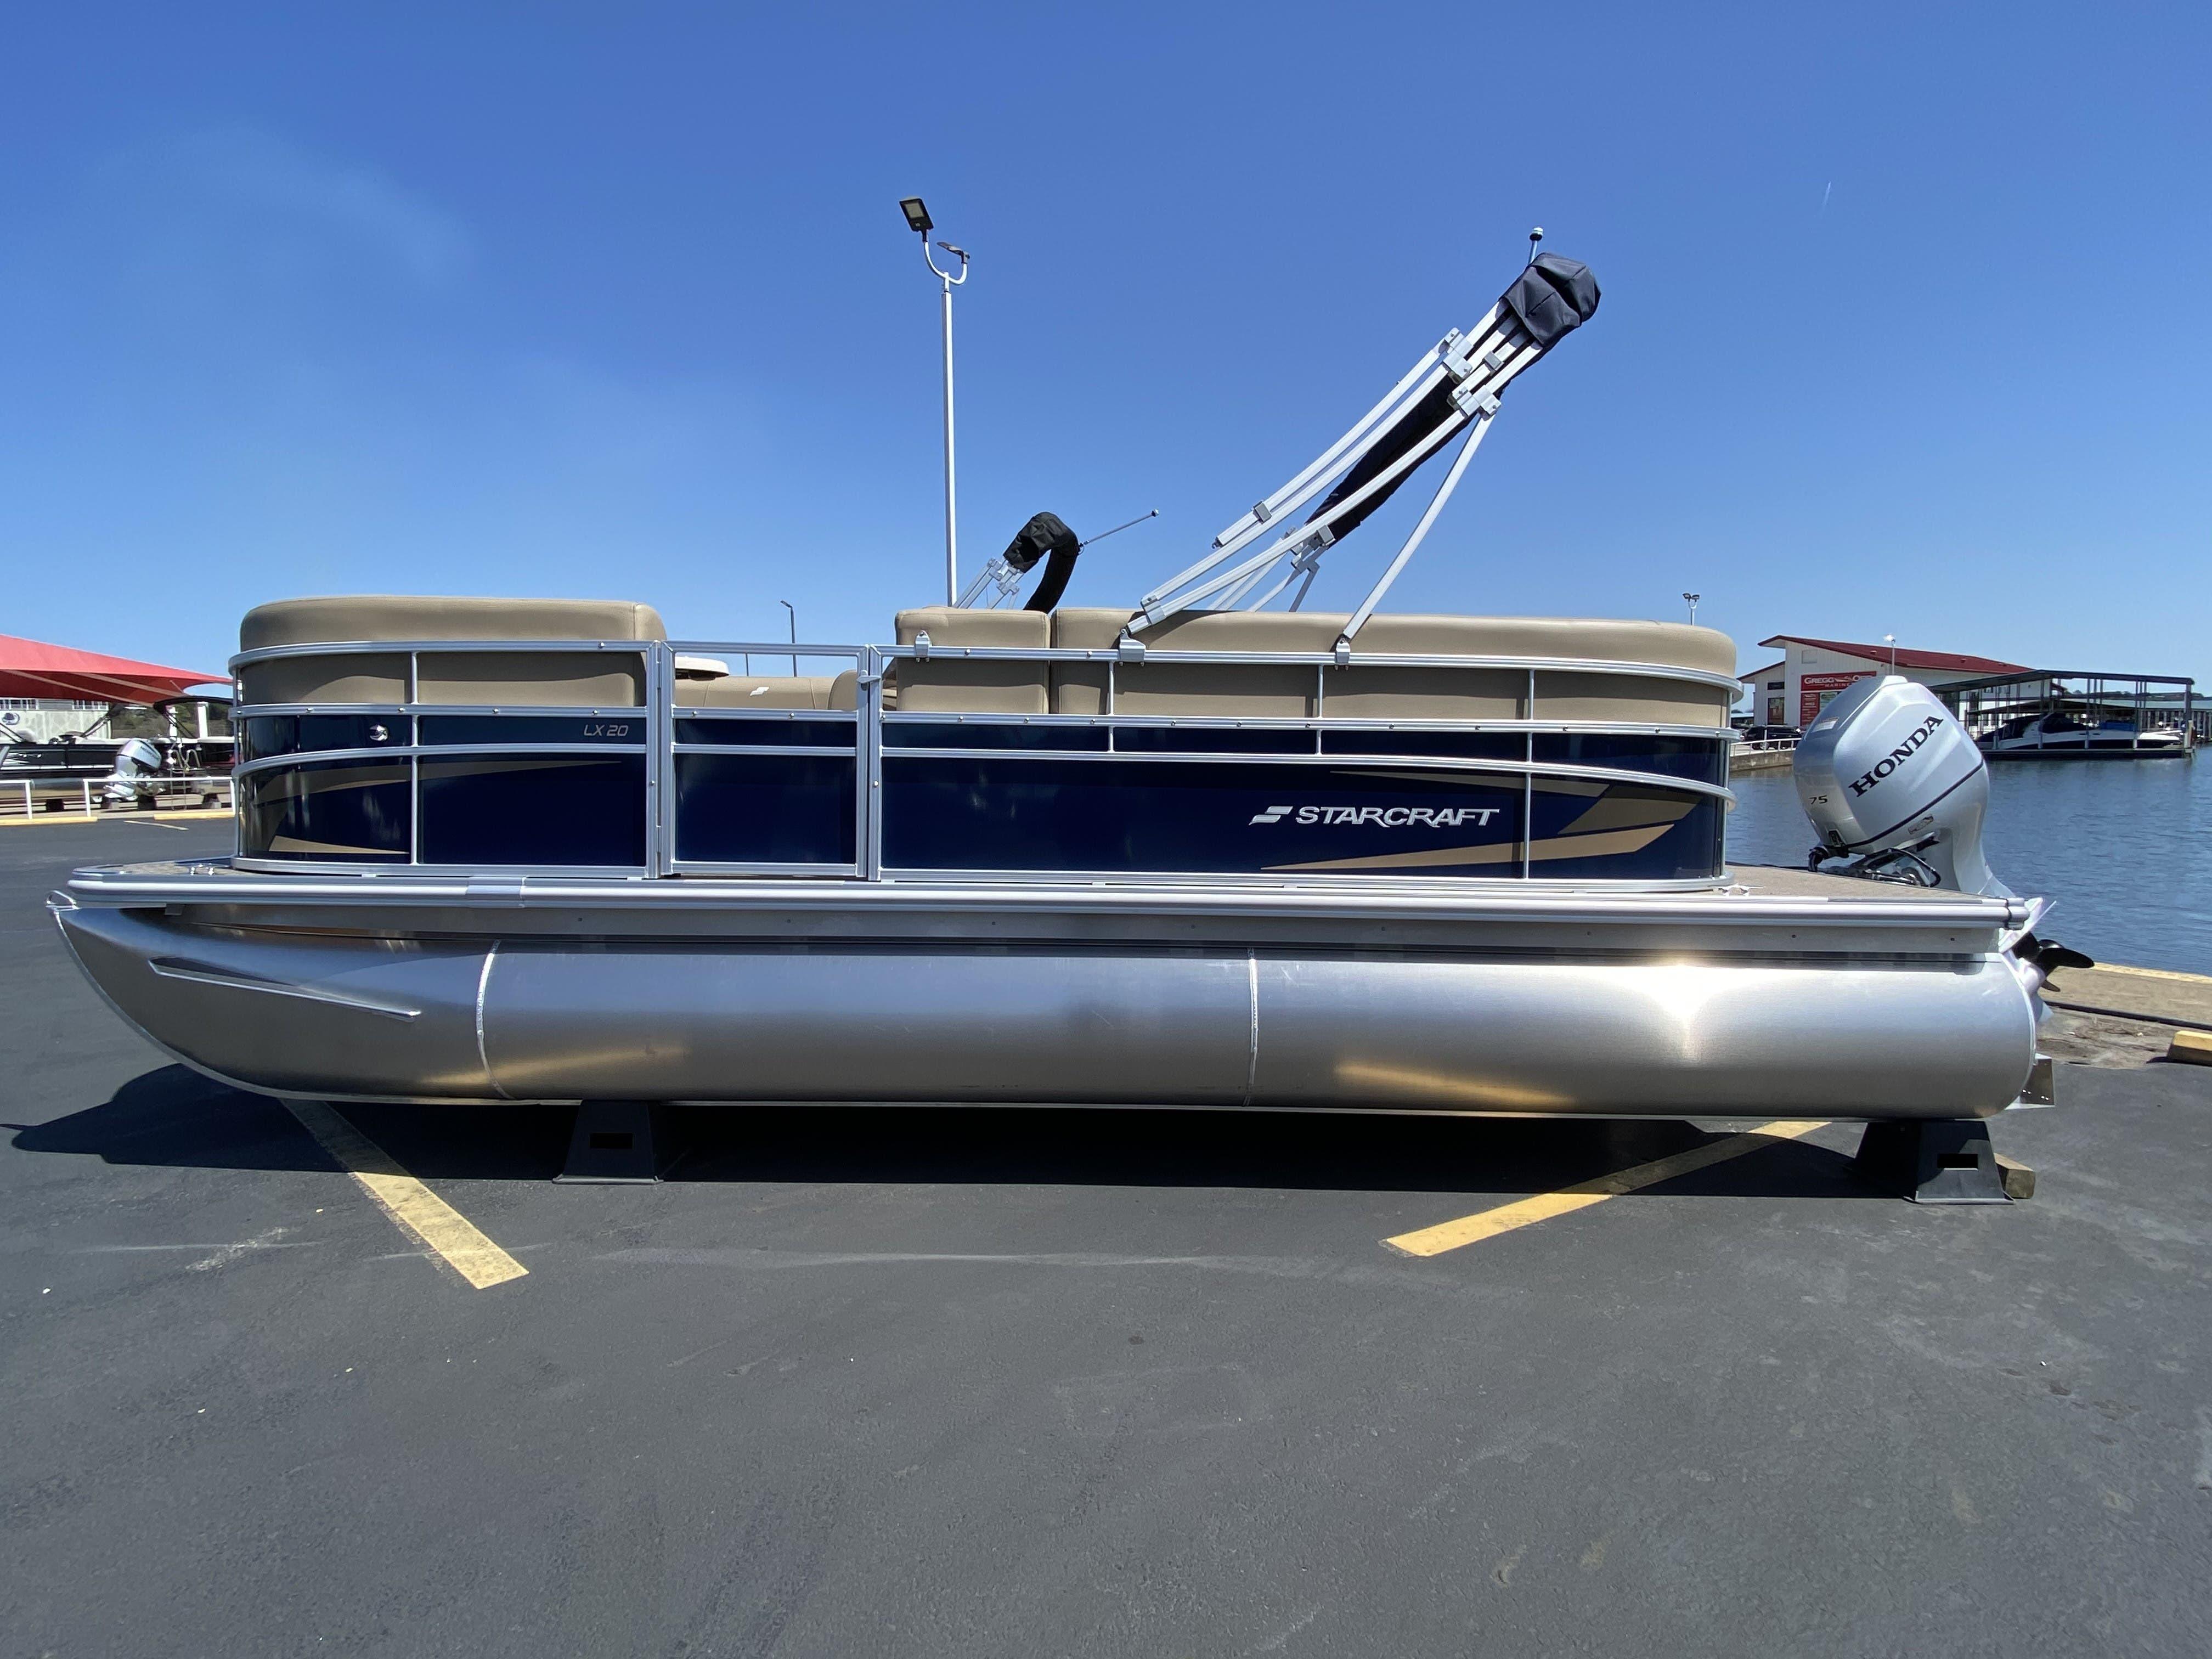 Starcraft LX 20 R